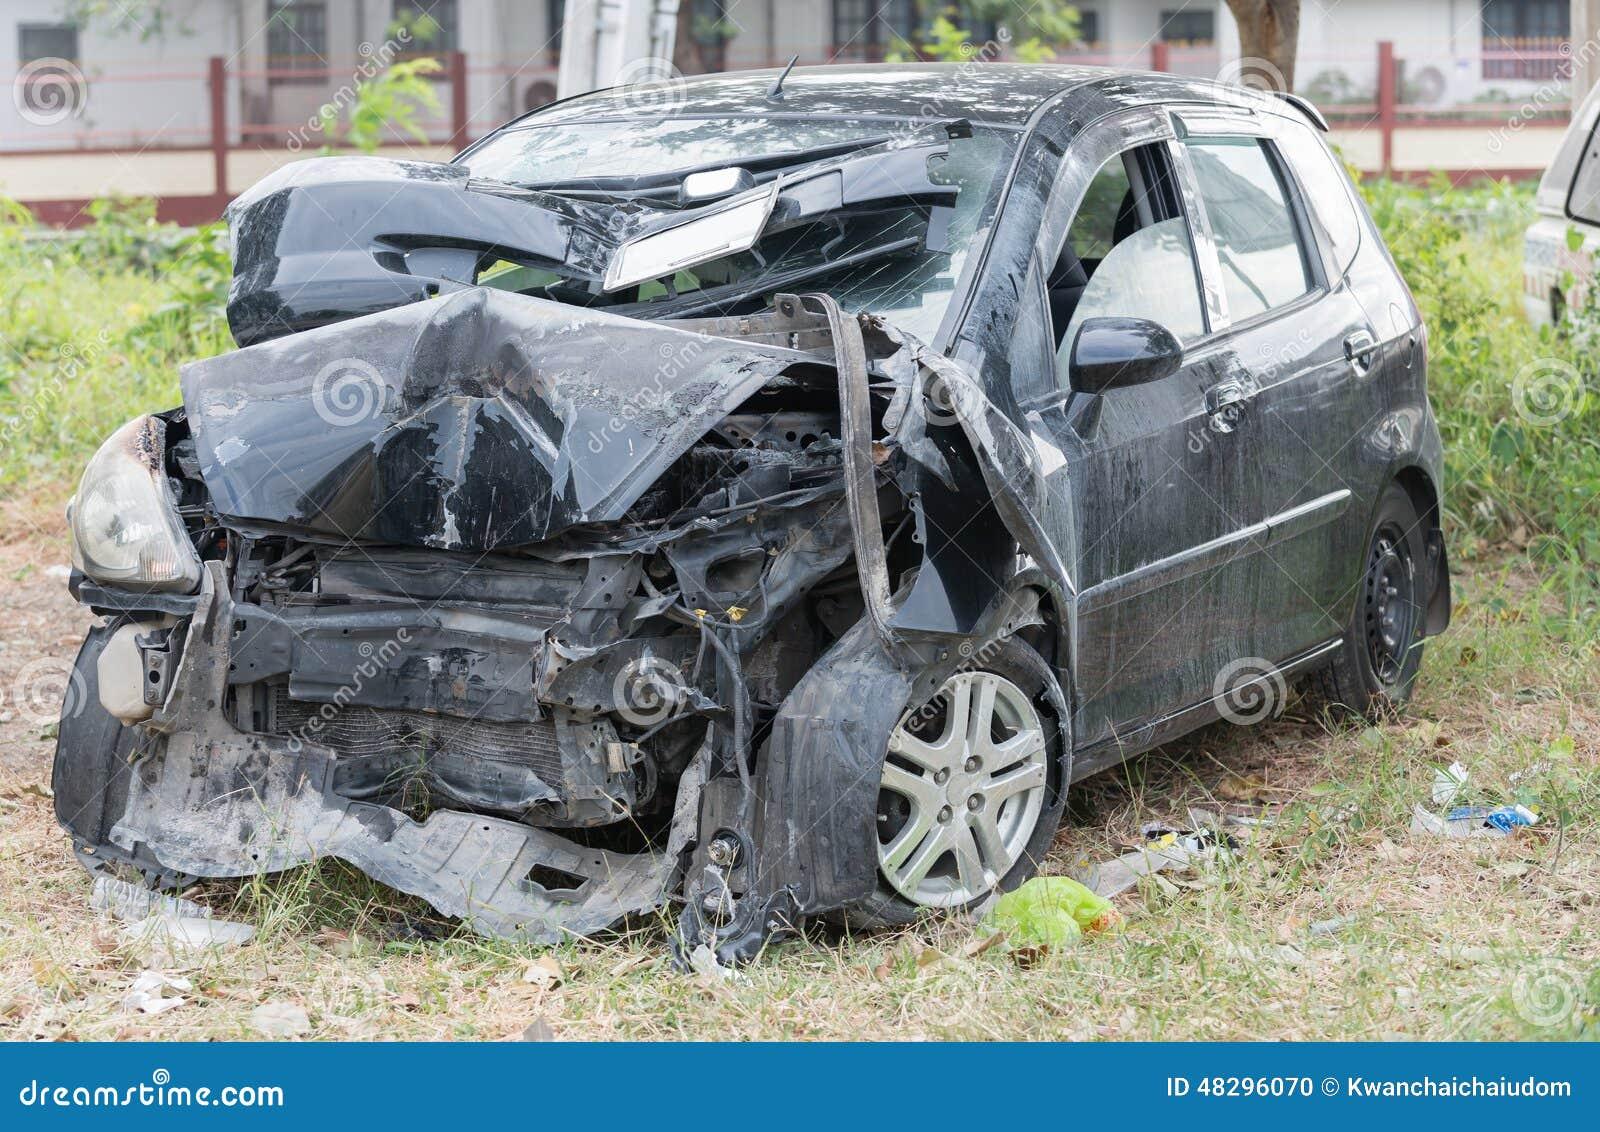 v hicule endommag apr s accident de voiture photo stock image du collision cass 48296070. Black Bedroom Furniture Sets. Home Design Ideas